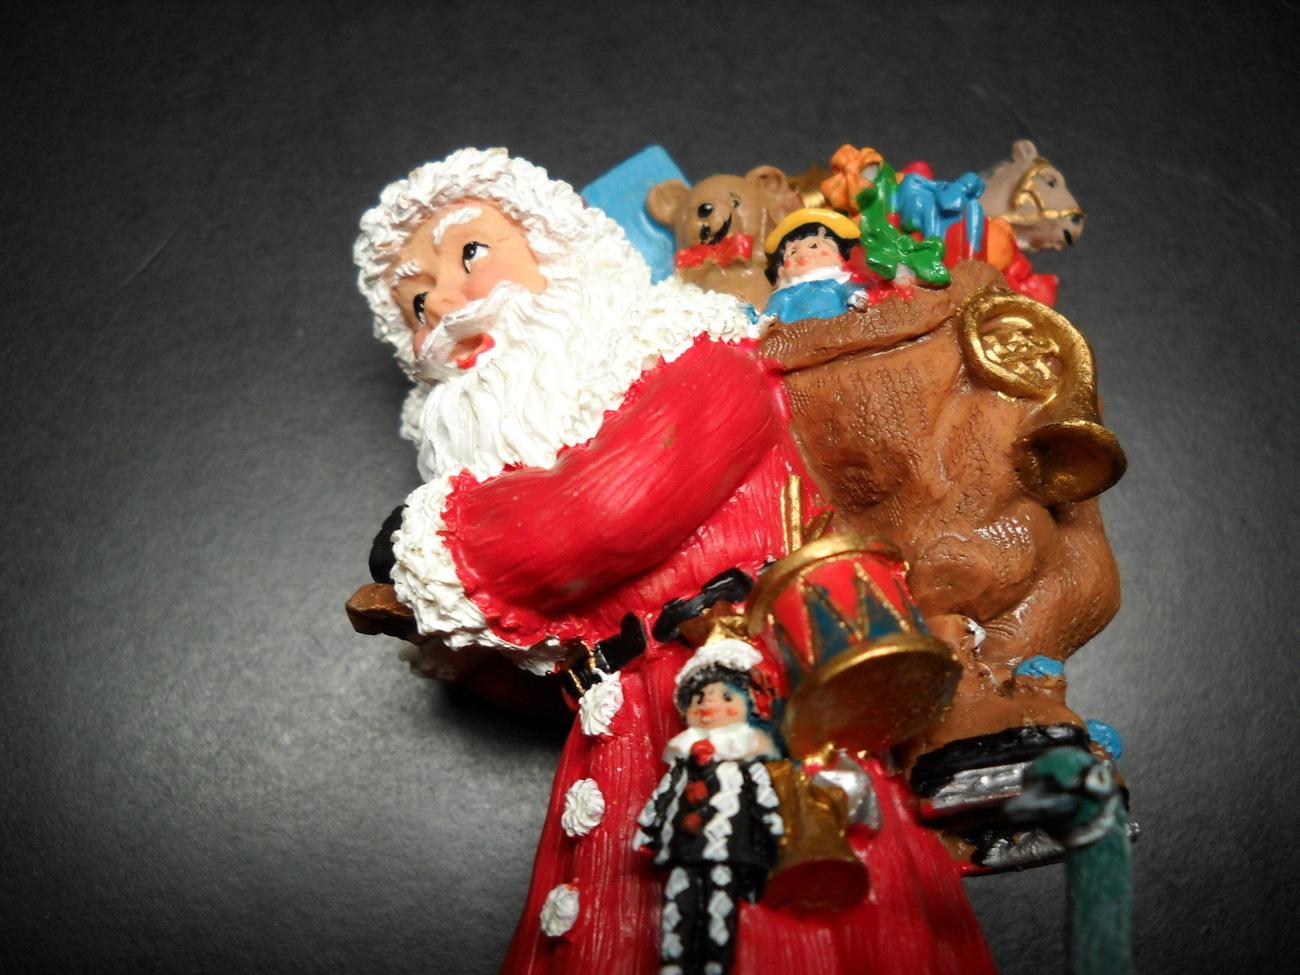 Christmas ornament international santa claus collection